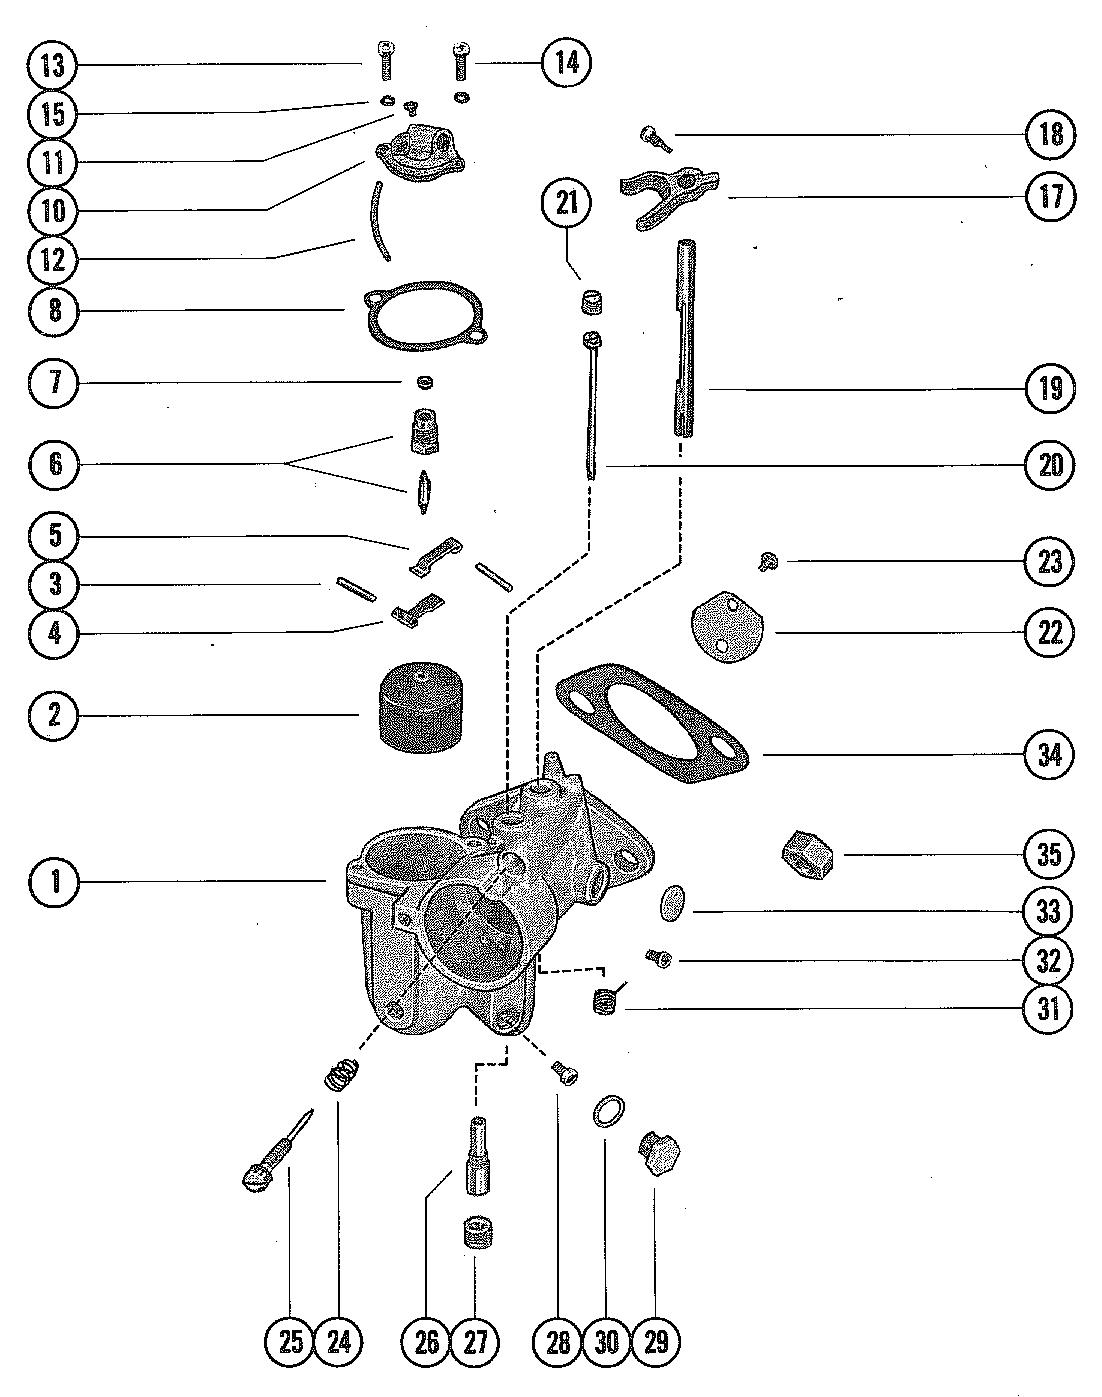 Mercury Outboard Engine Parts Diagram